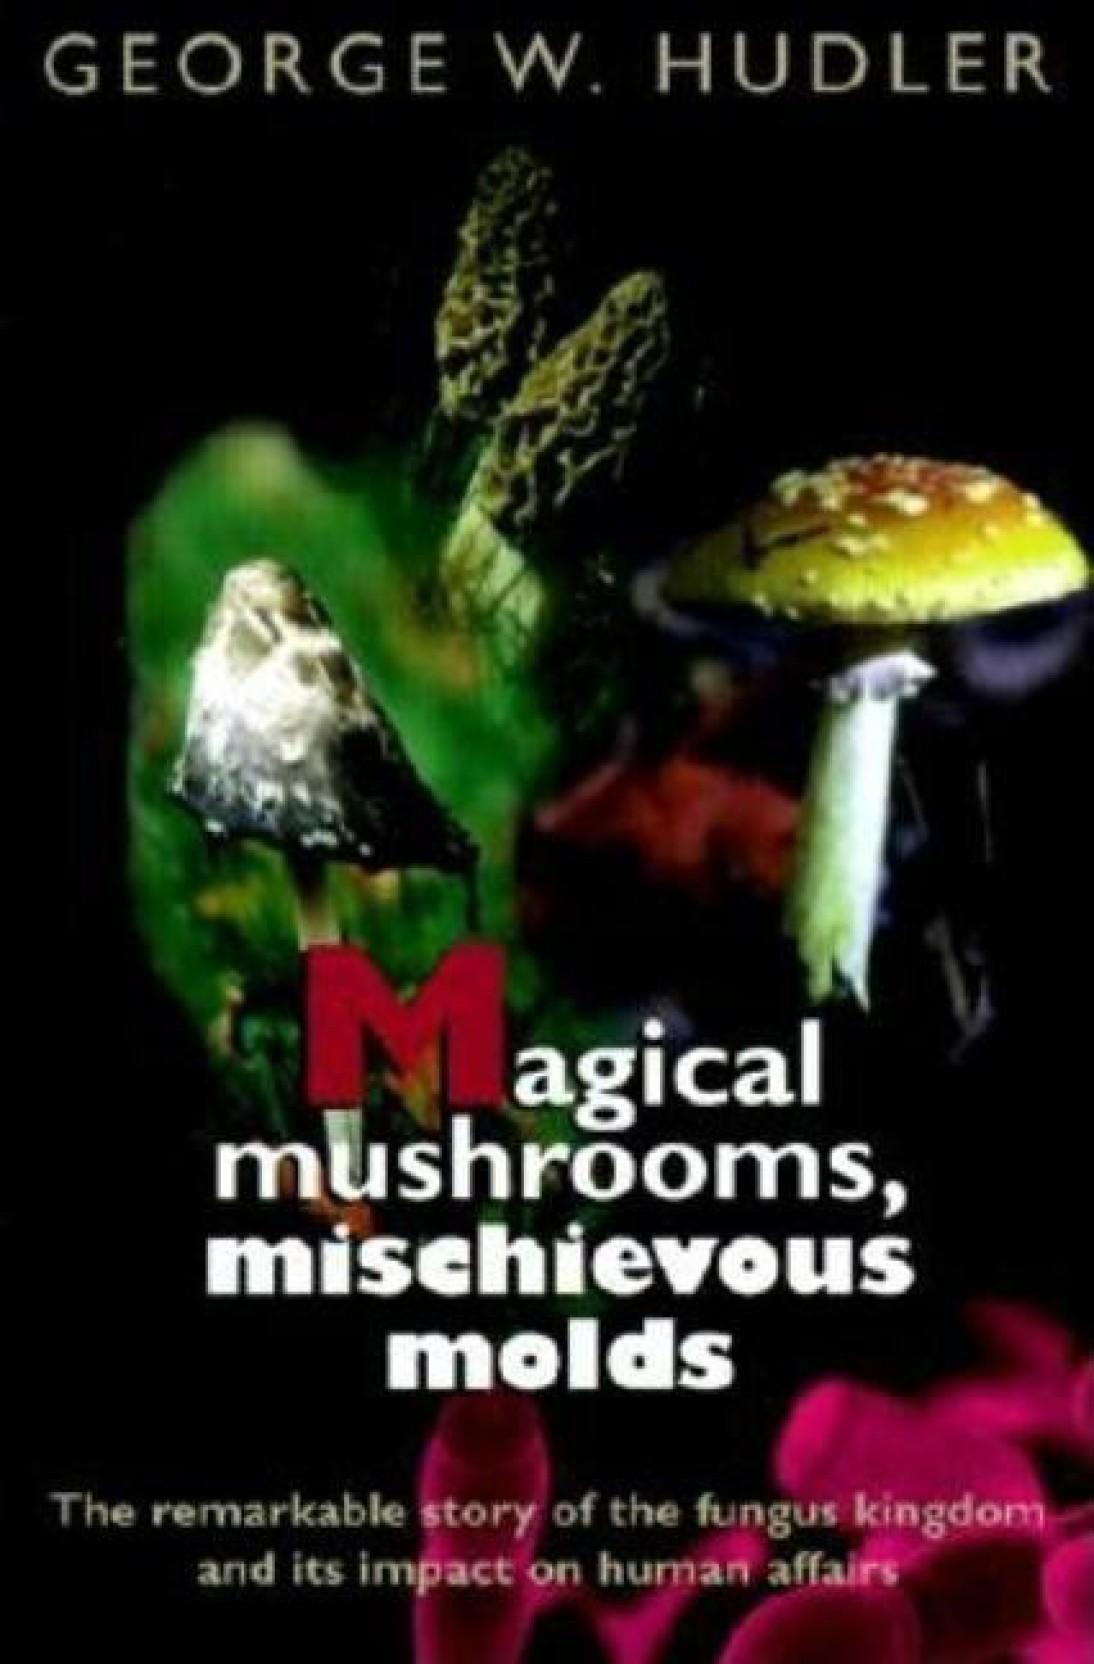 Magical Mushrooms, Mischievous Molds. ADD TO CART